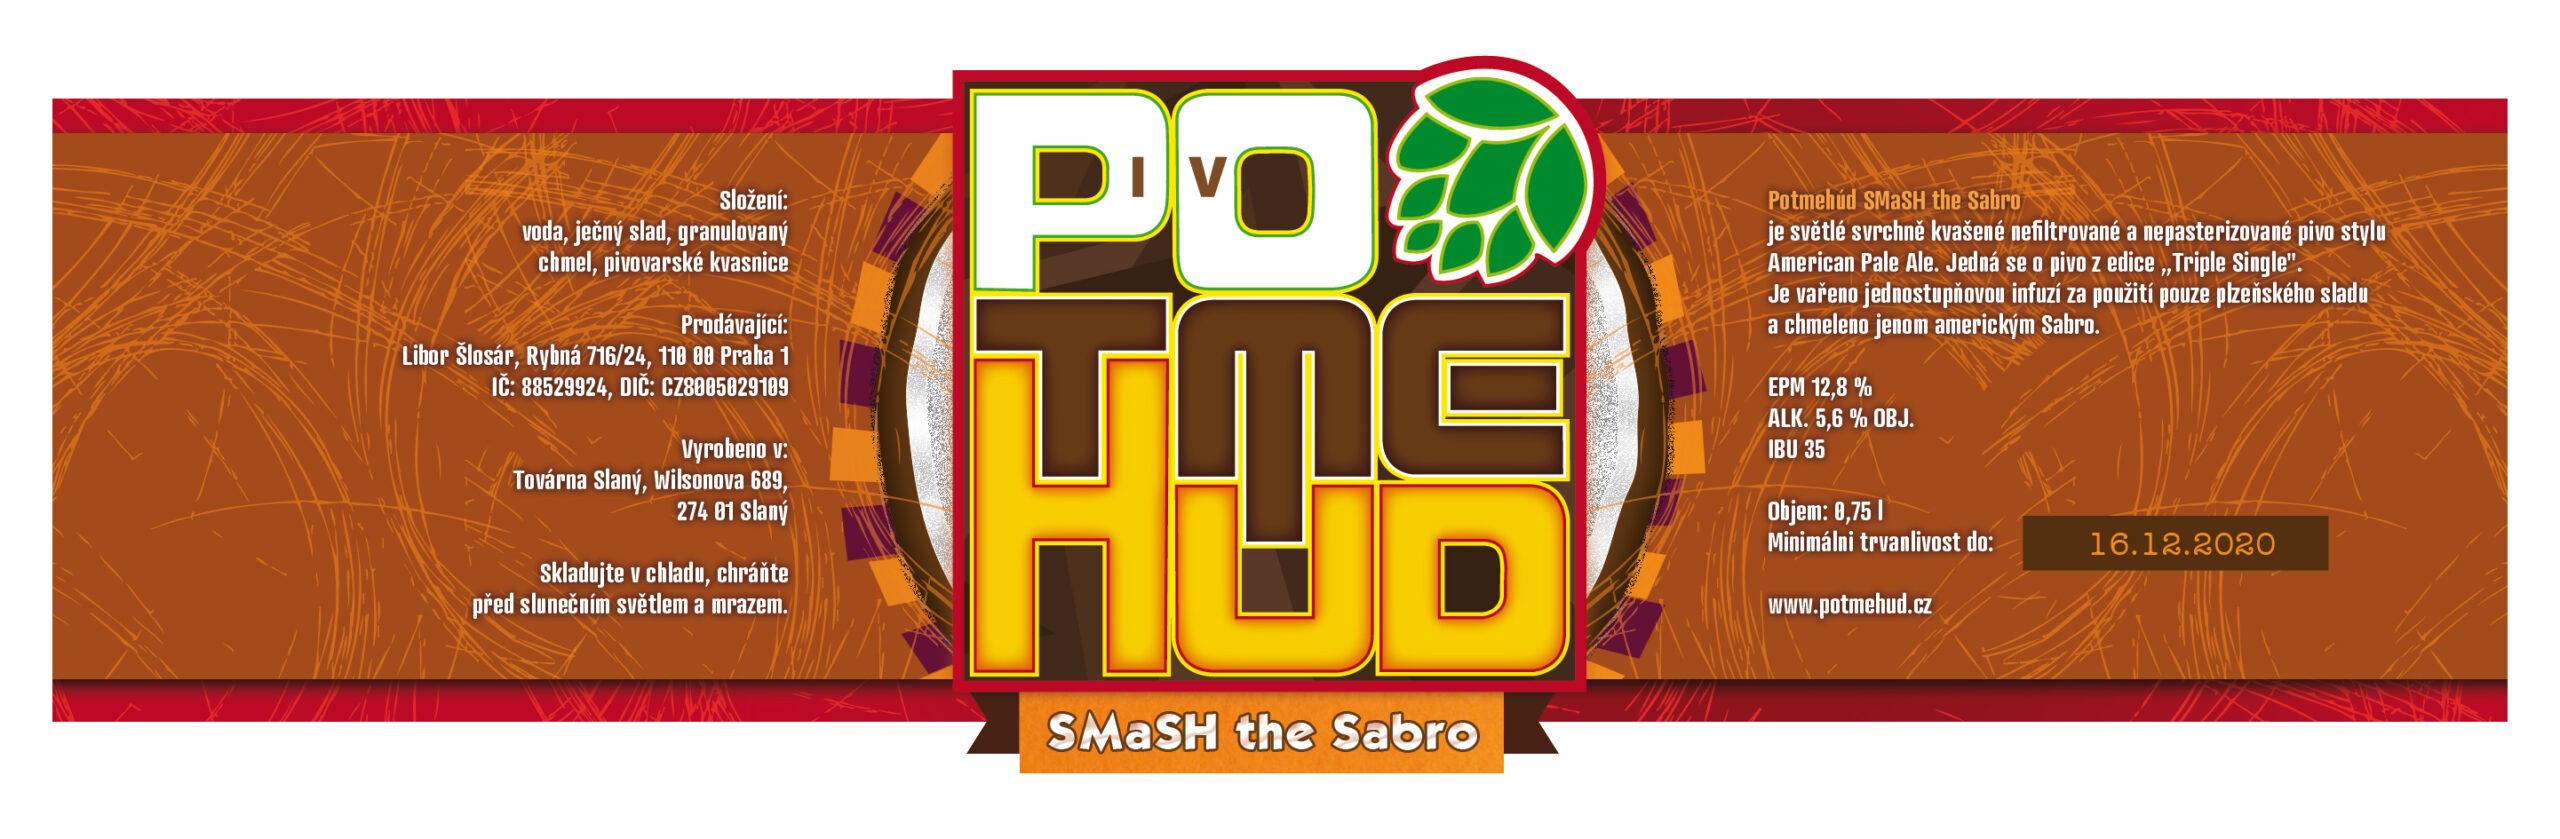 potmehud_etiketa_design_092020_SMaSHtheSabro